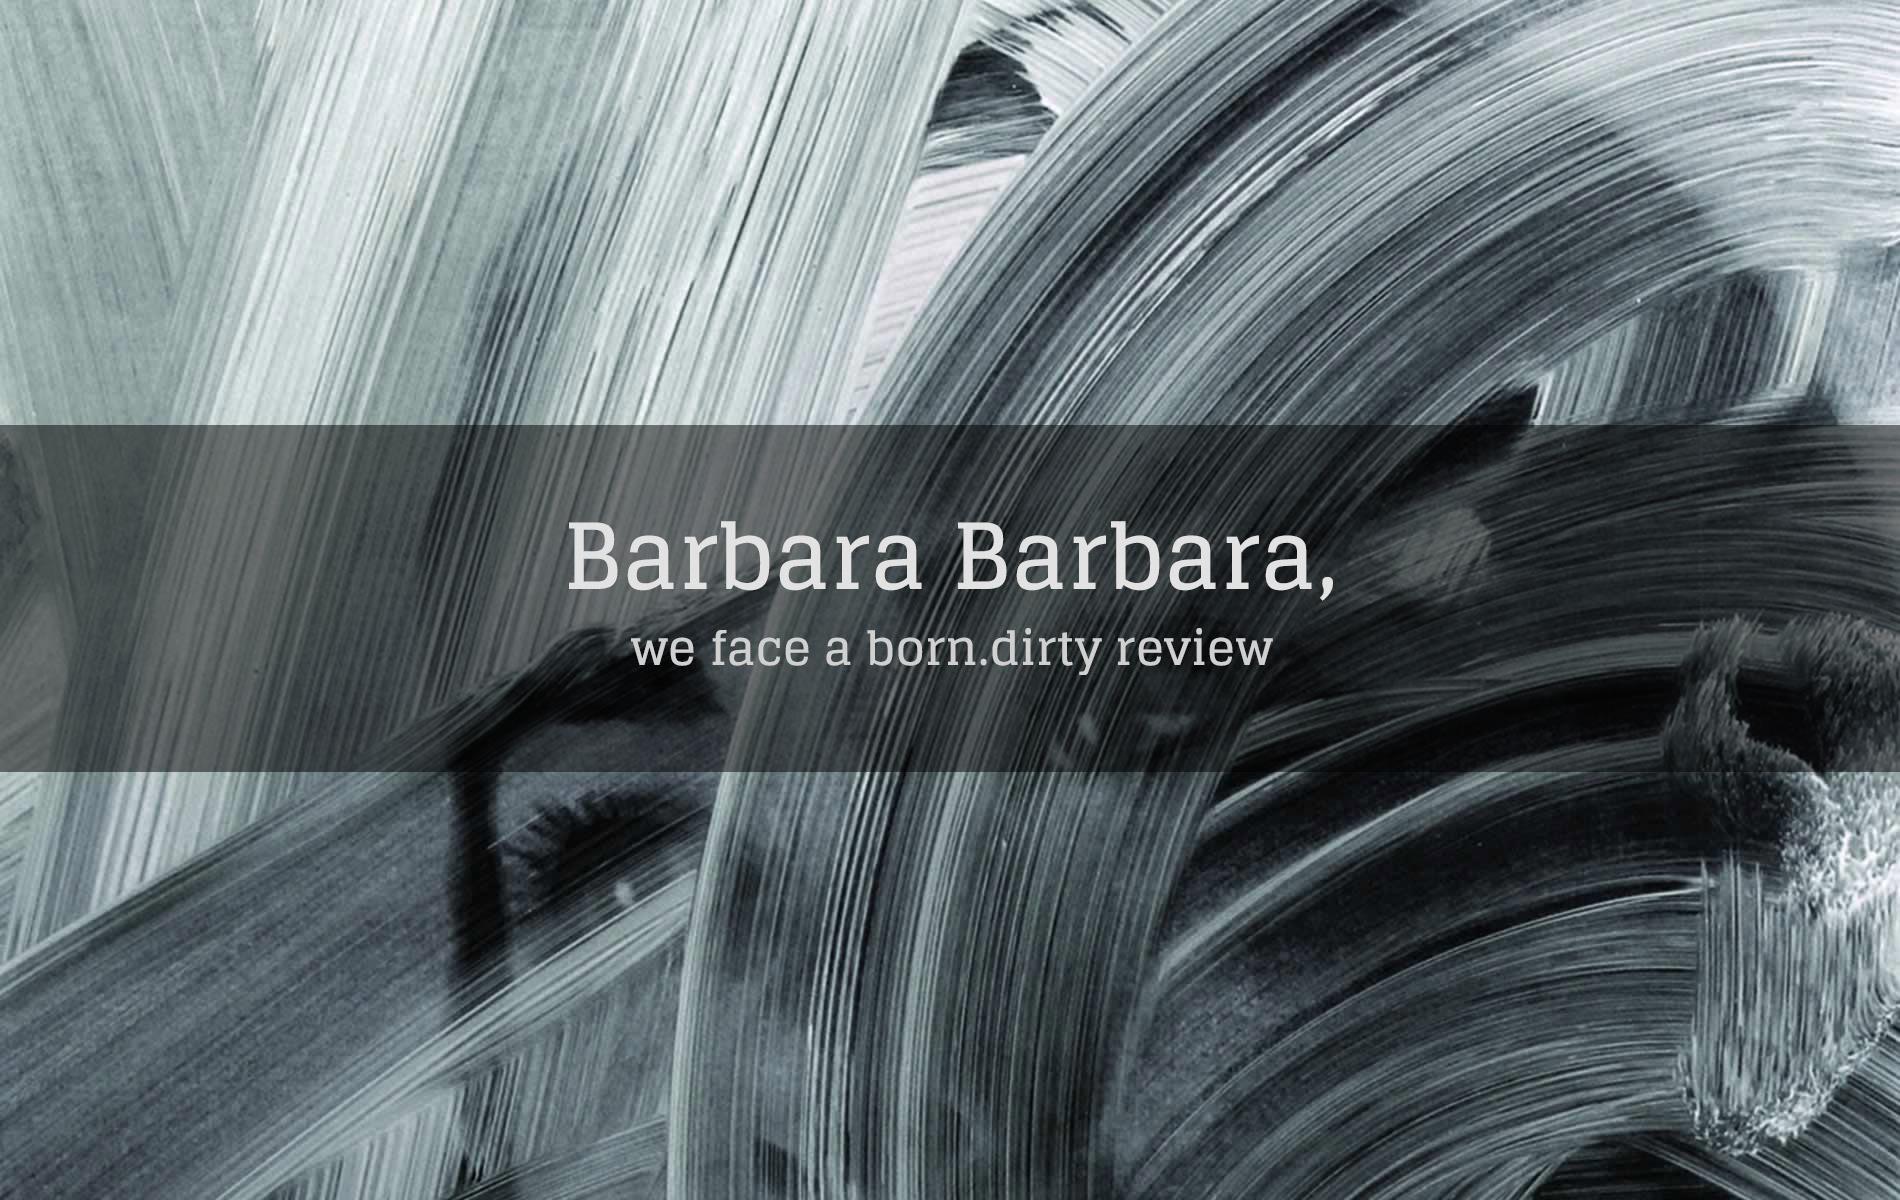 underworld-barbara-barbara-review-born-dirty